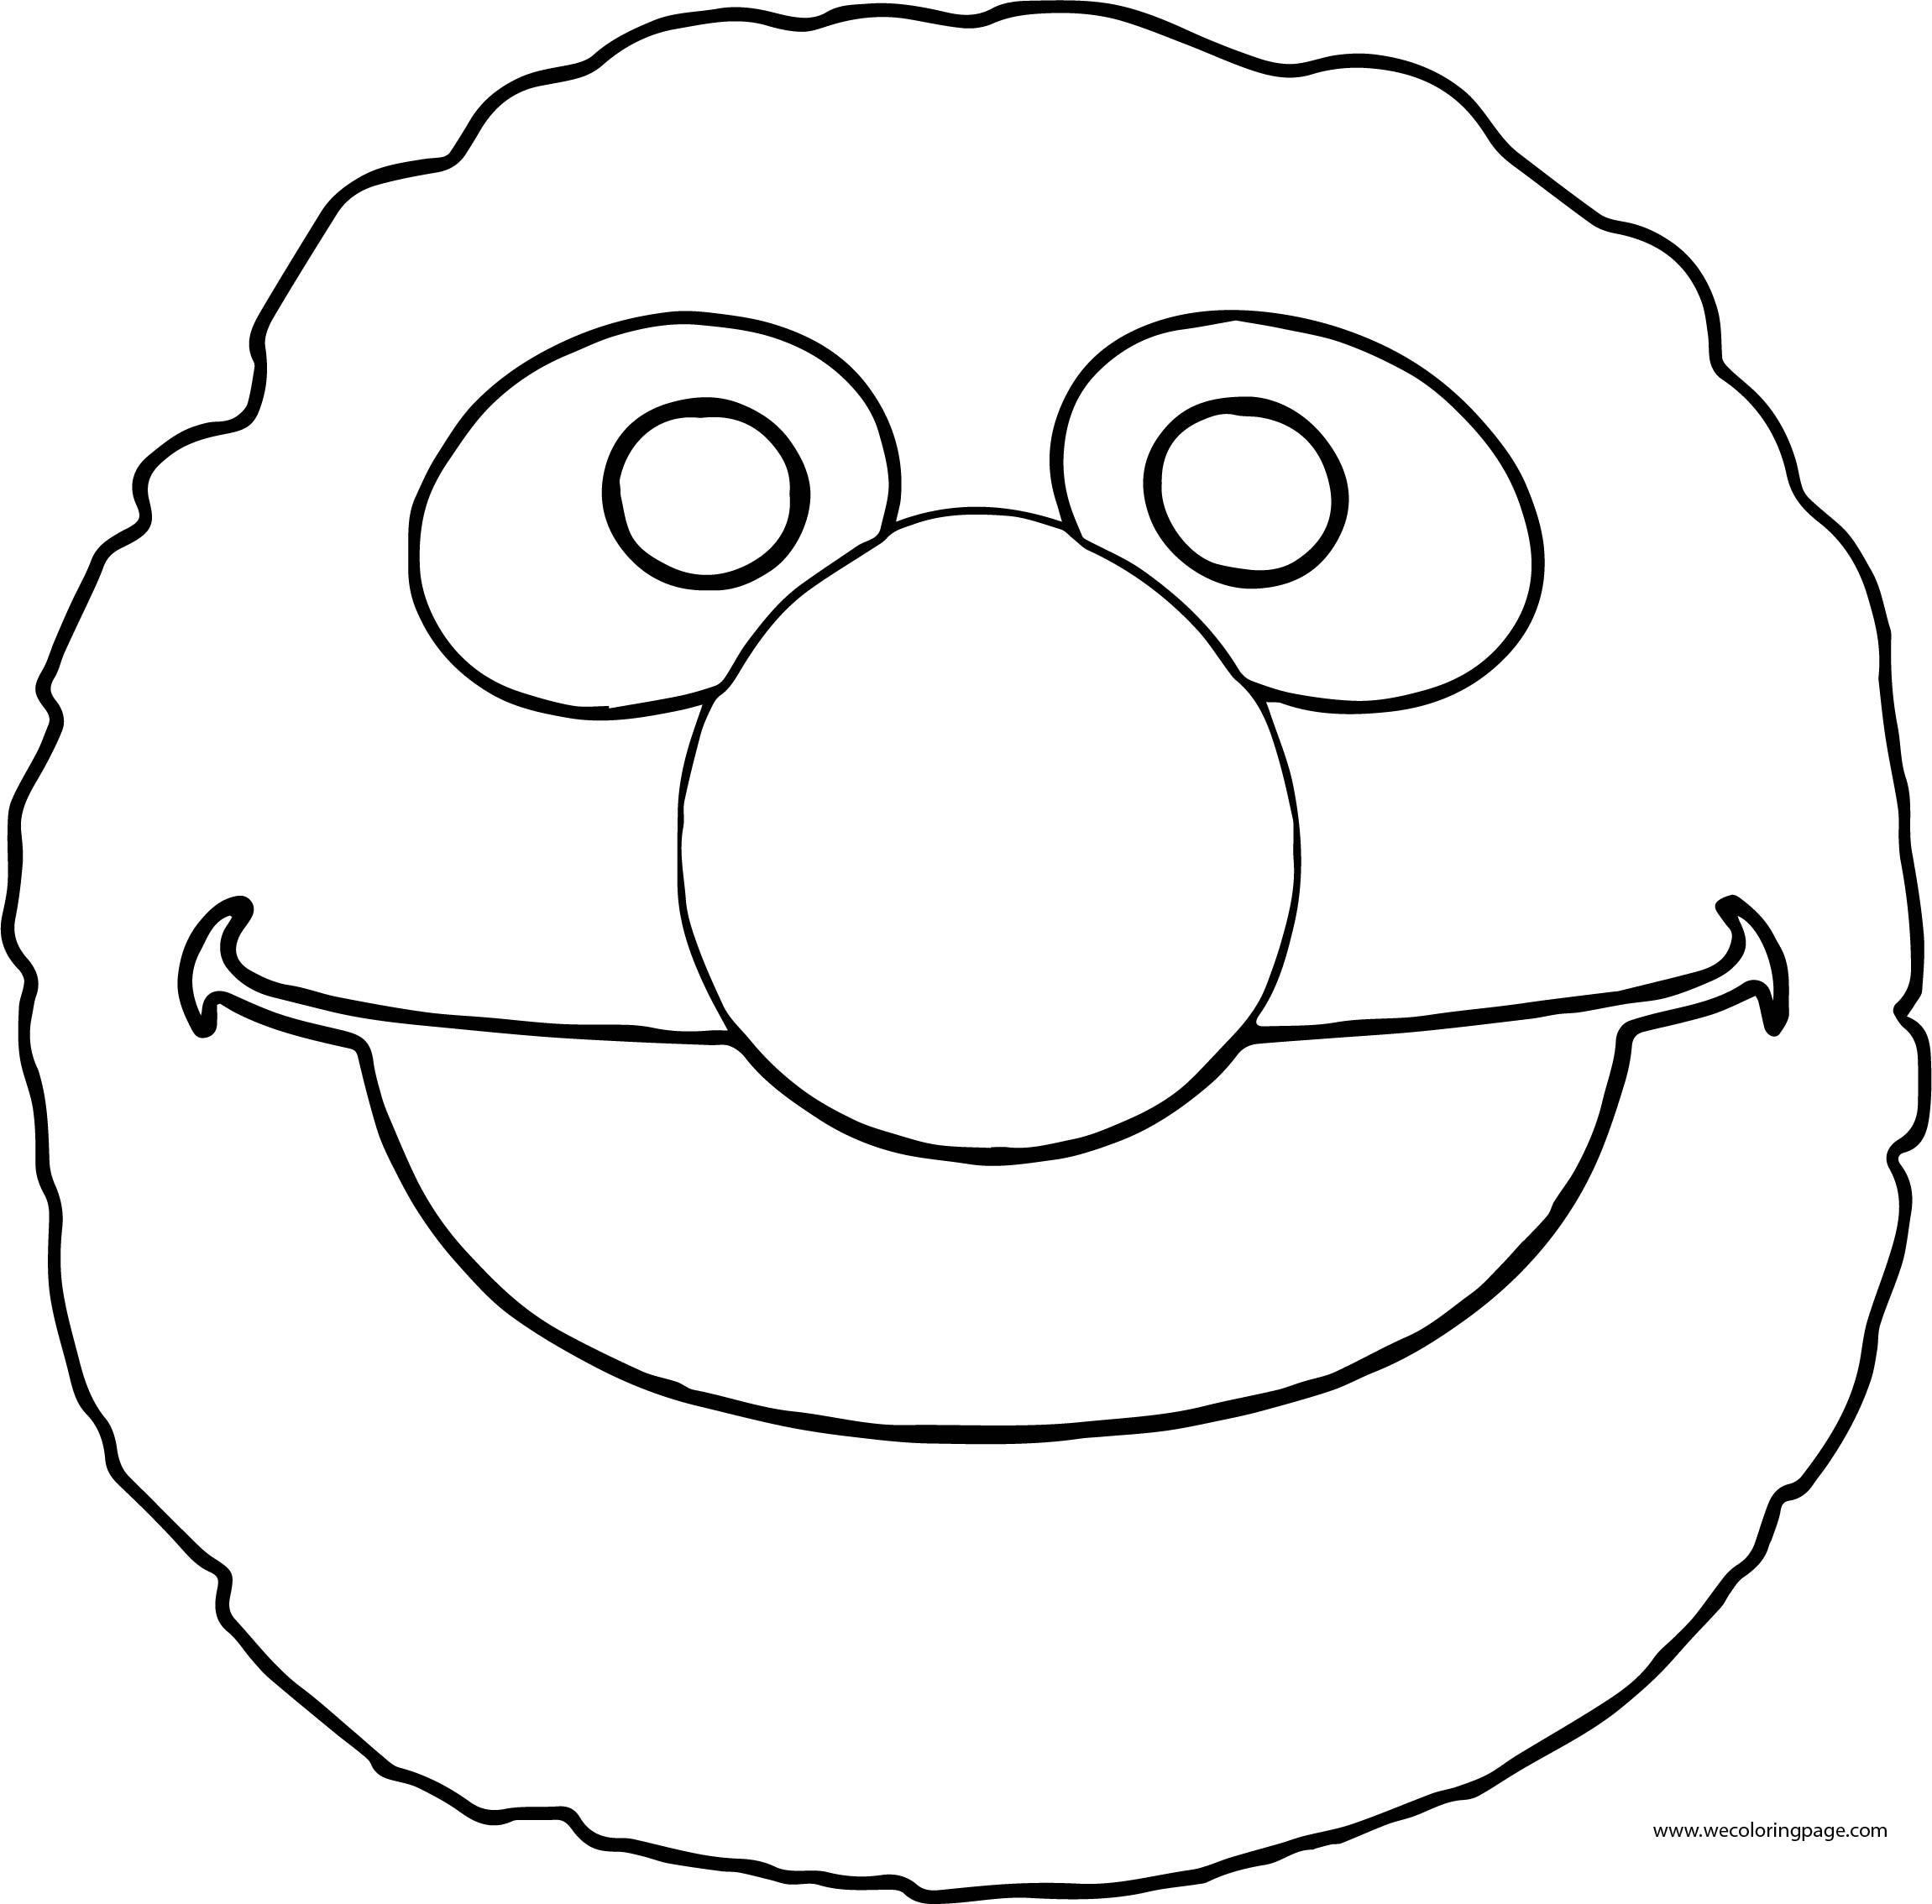 Sesame Street Sign Coloring Page Sesame Street Sign Baseball Wiring Diagram Database